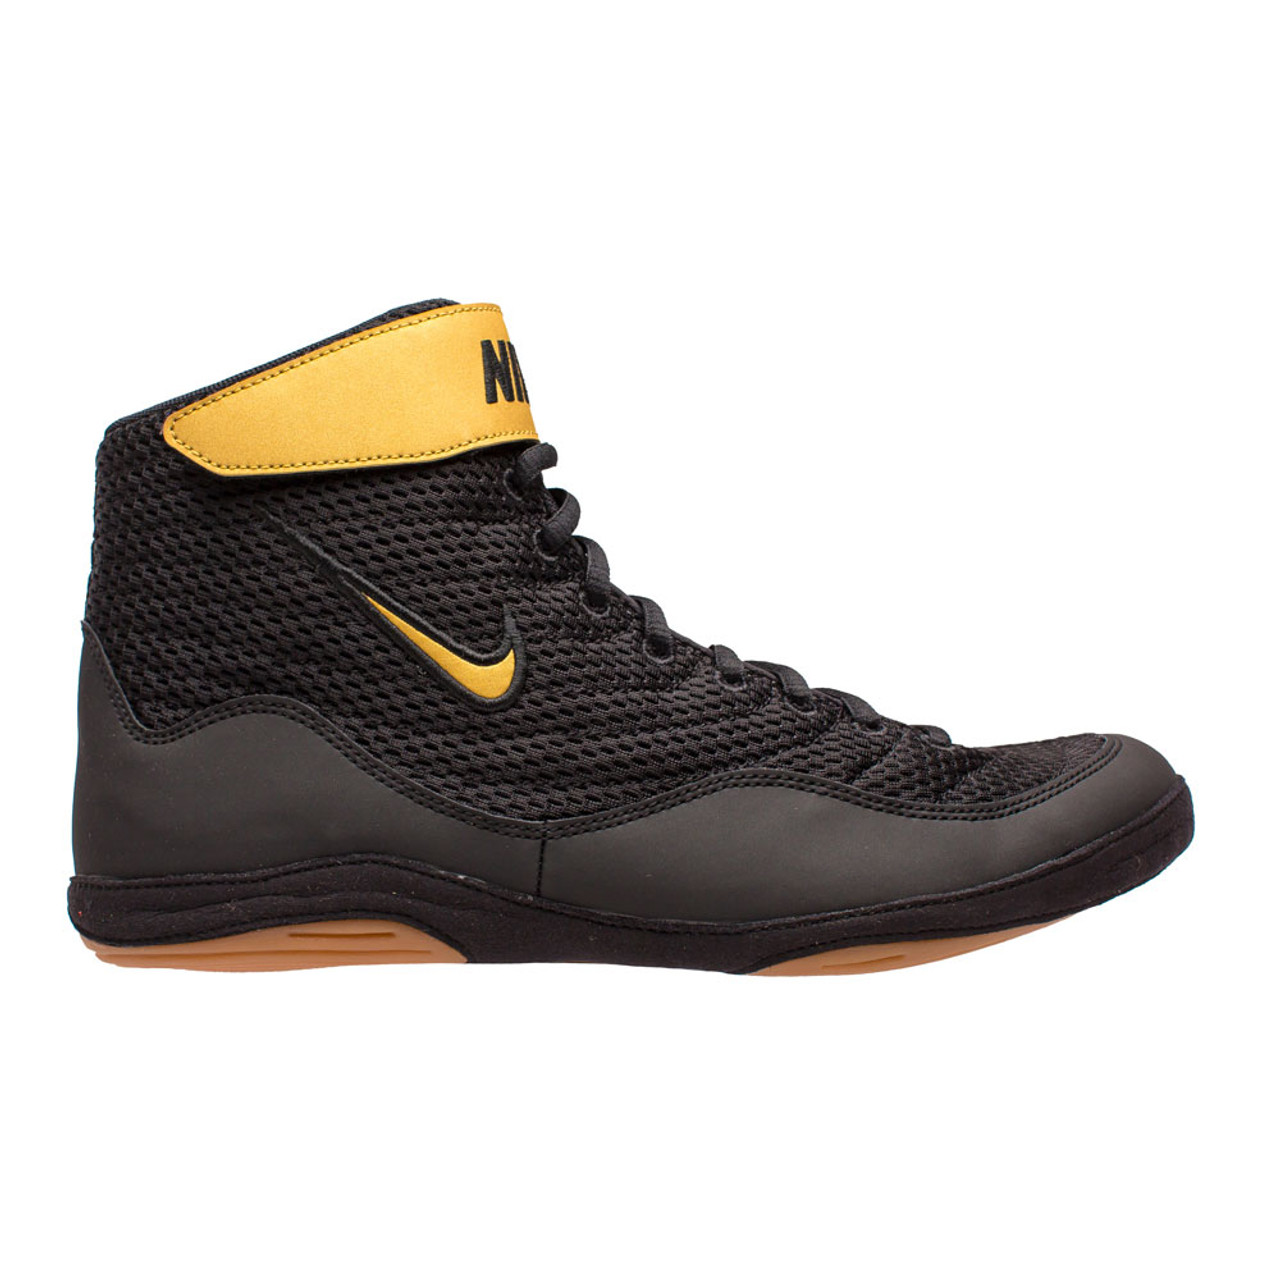 Nike Inflict 3 , Black/Metallic Gold/Black